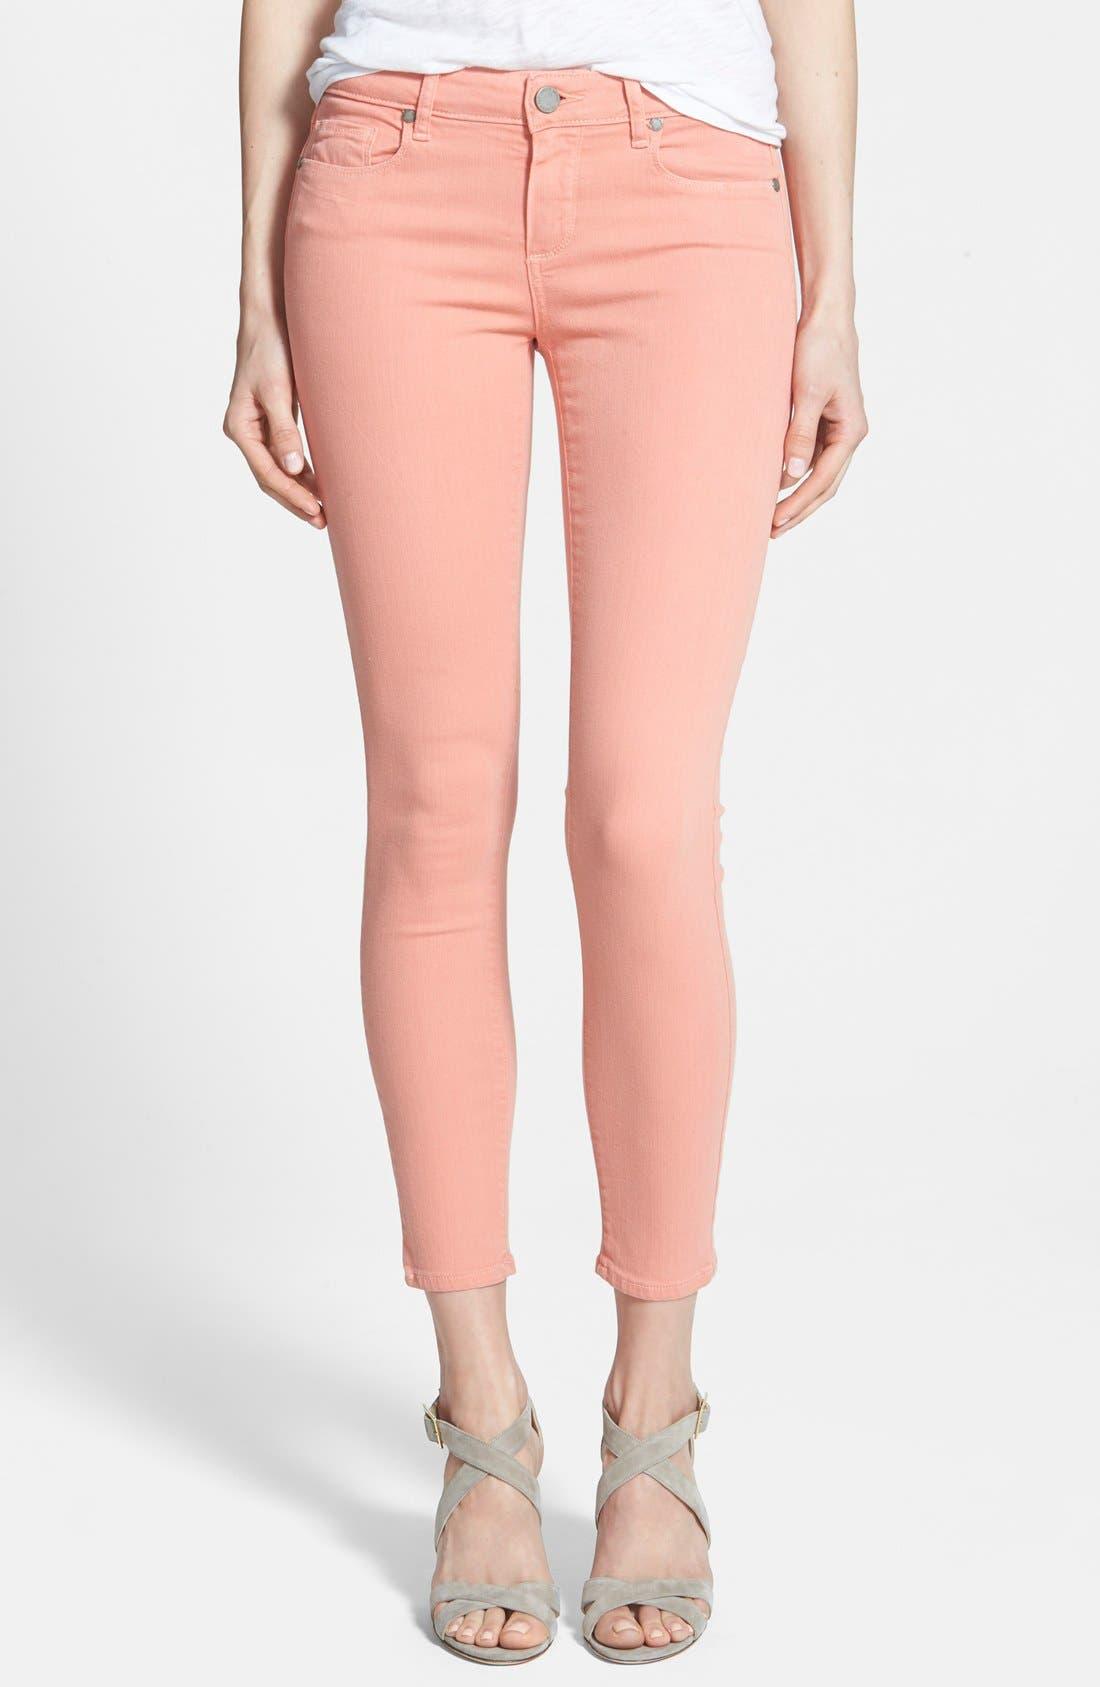 Main Image - Paige Denim 'Verdugo' Ankle Super Skinny Jeans (Desert Sunset)